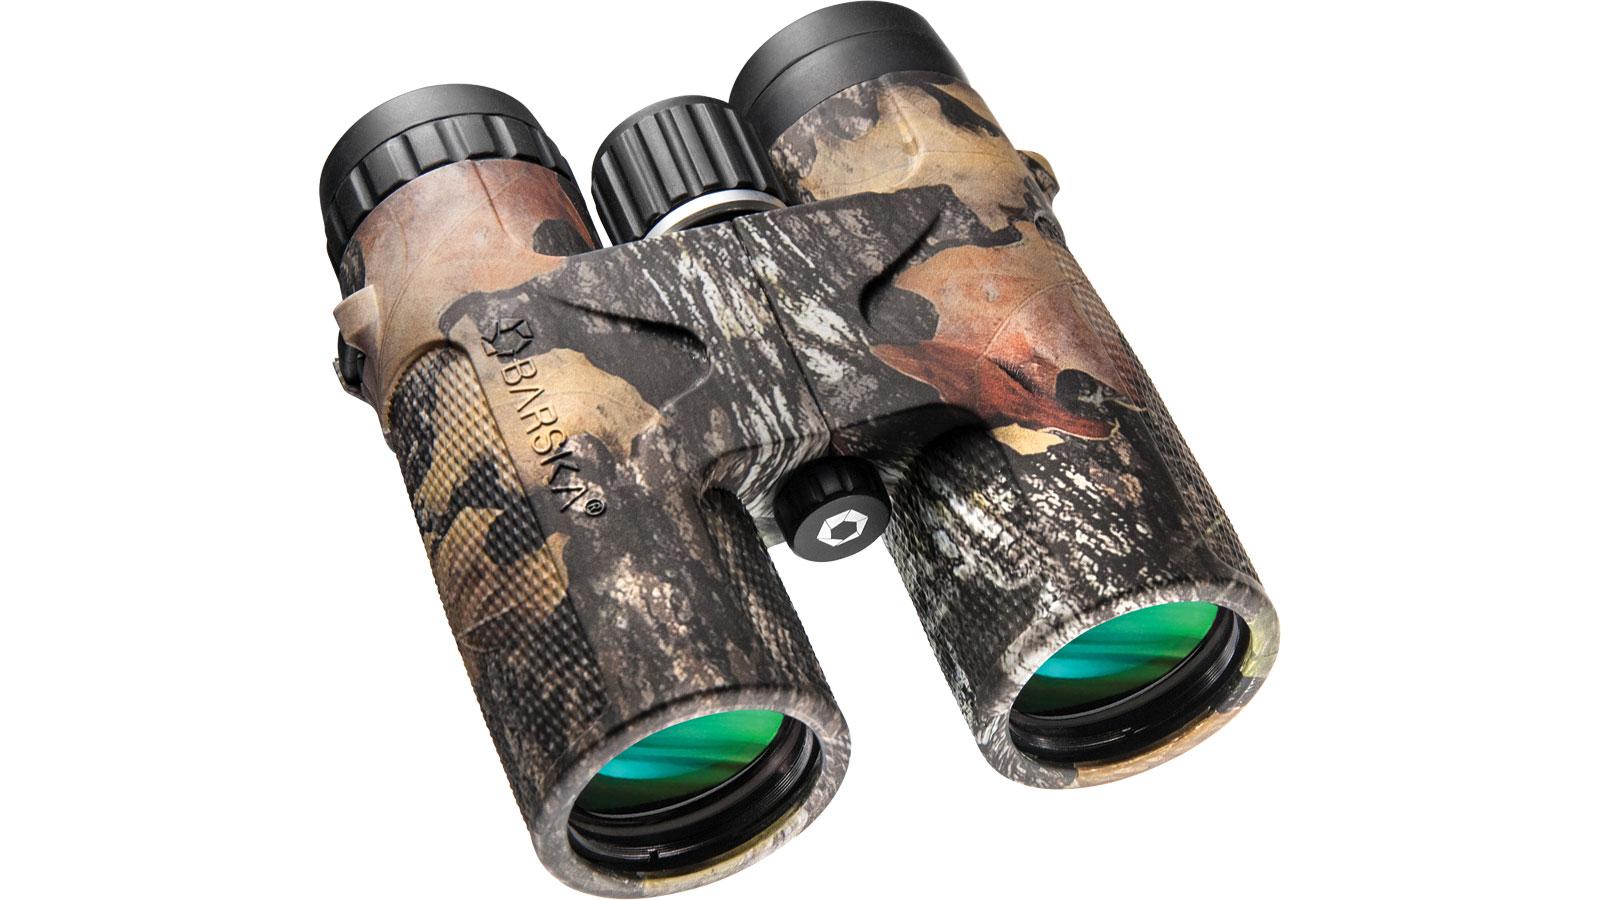 Barska Optics Blackhawk Binoculars 10x42mm, Mossy Oak, Clam Pack